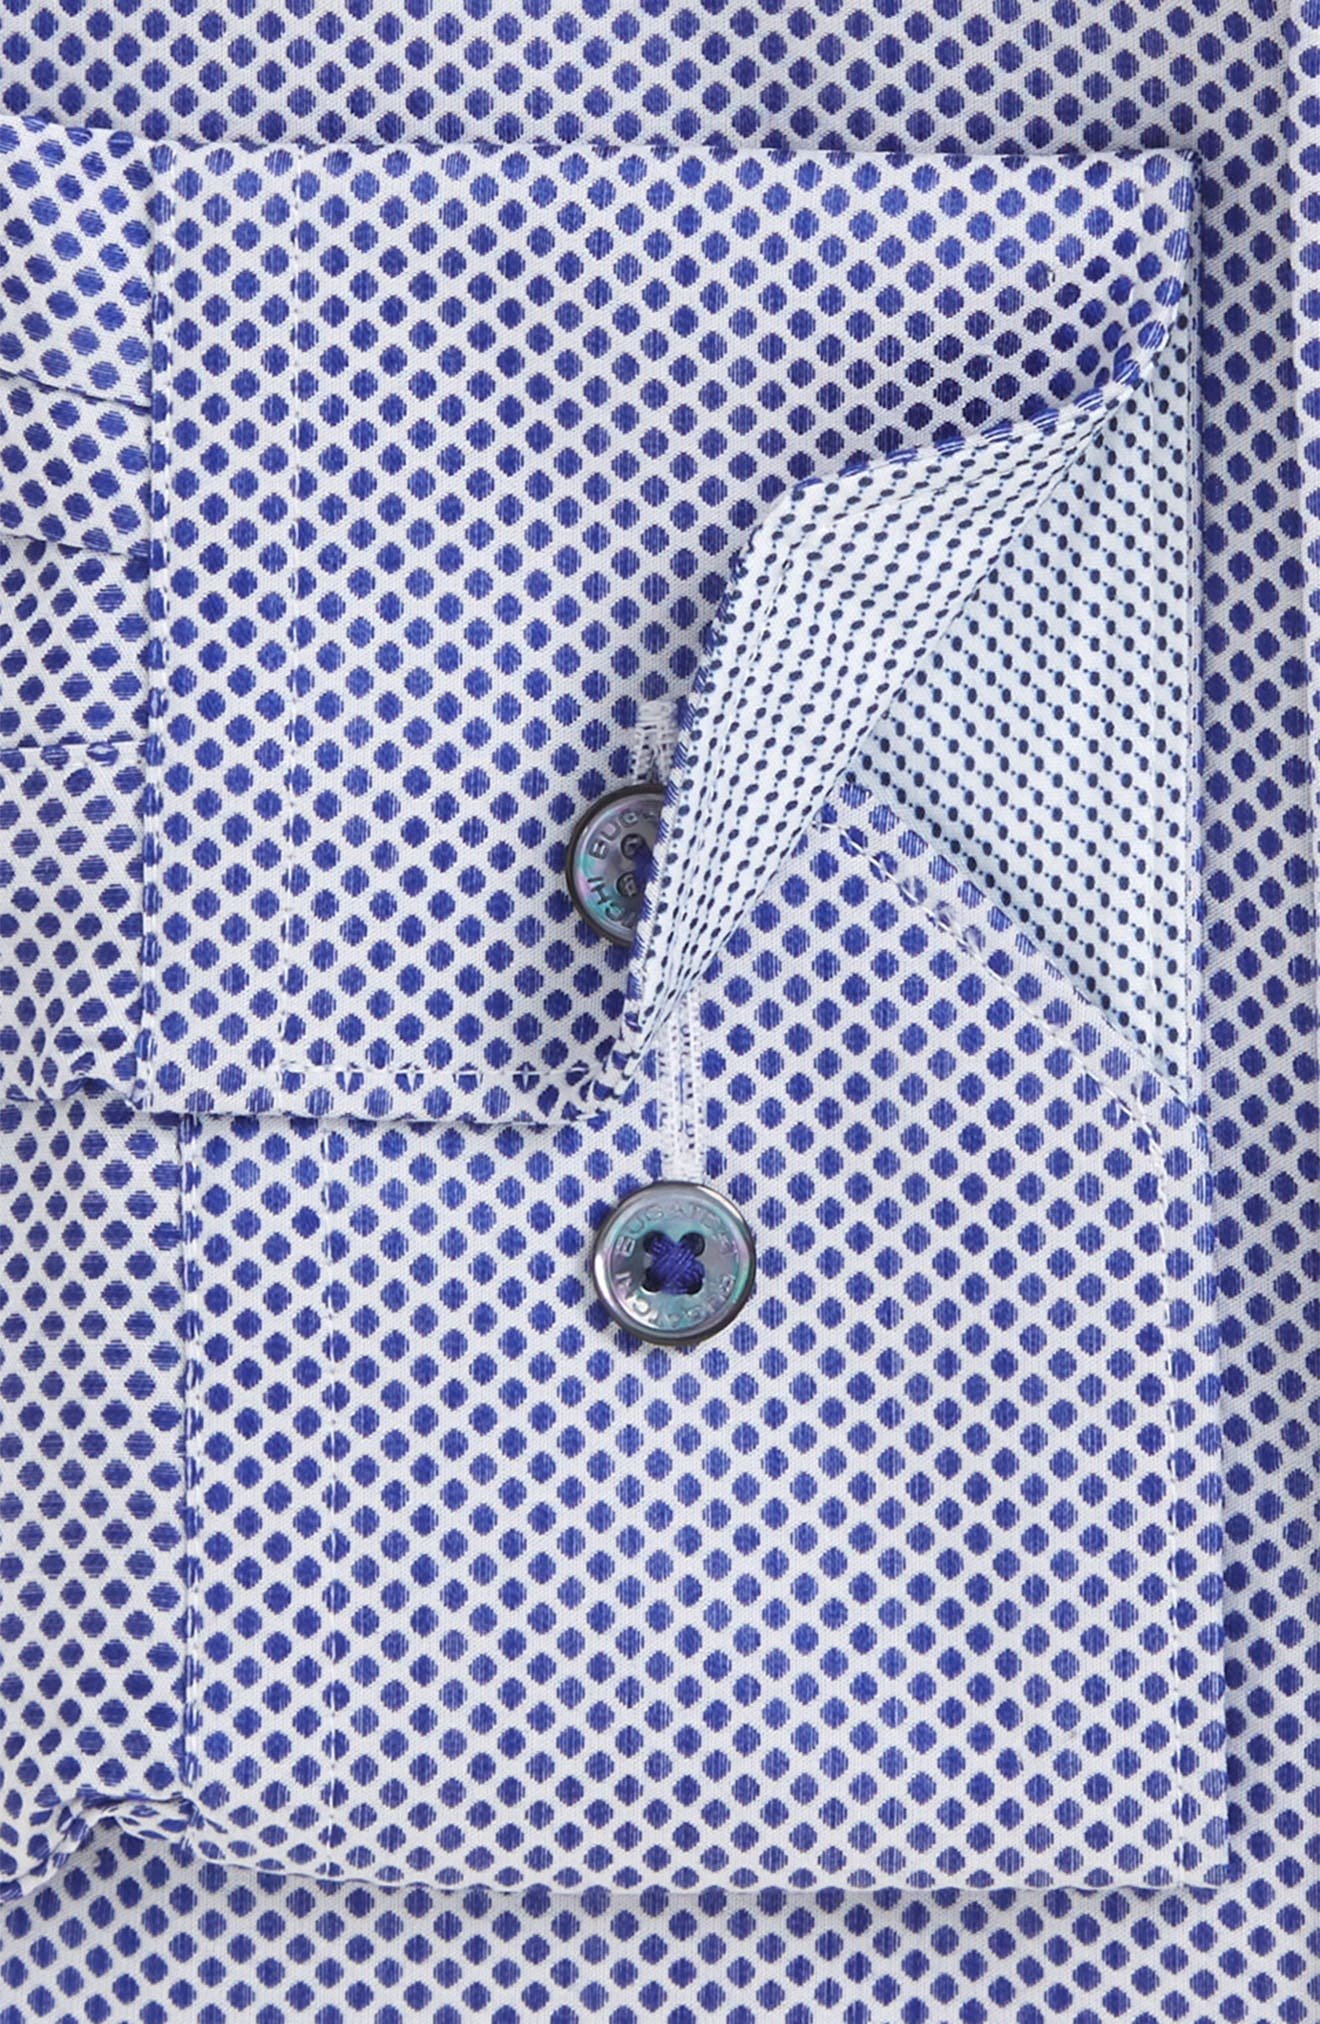 Trim Fit Dot Dress Shirt,                             Main thumbnail 1, color,                             411